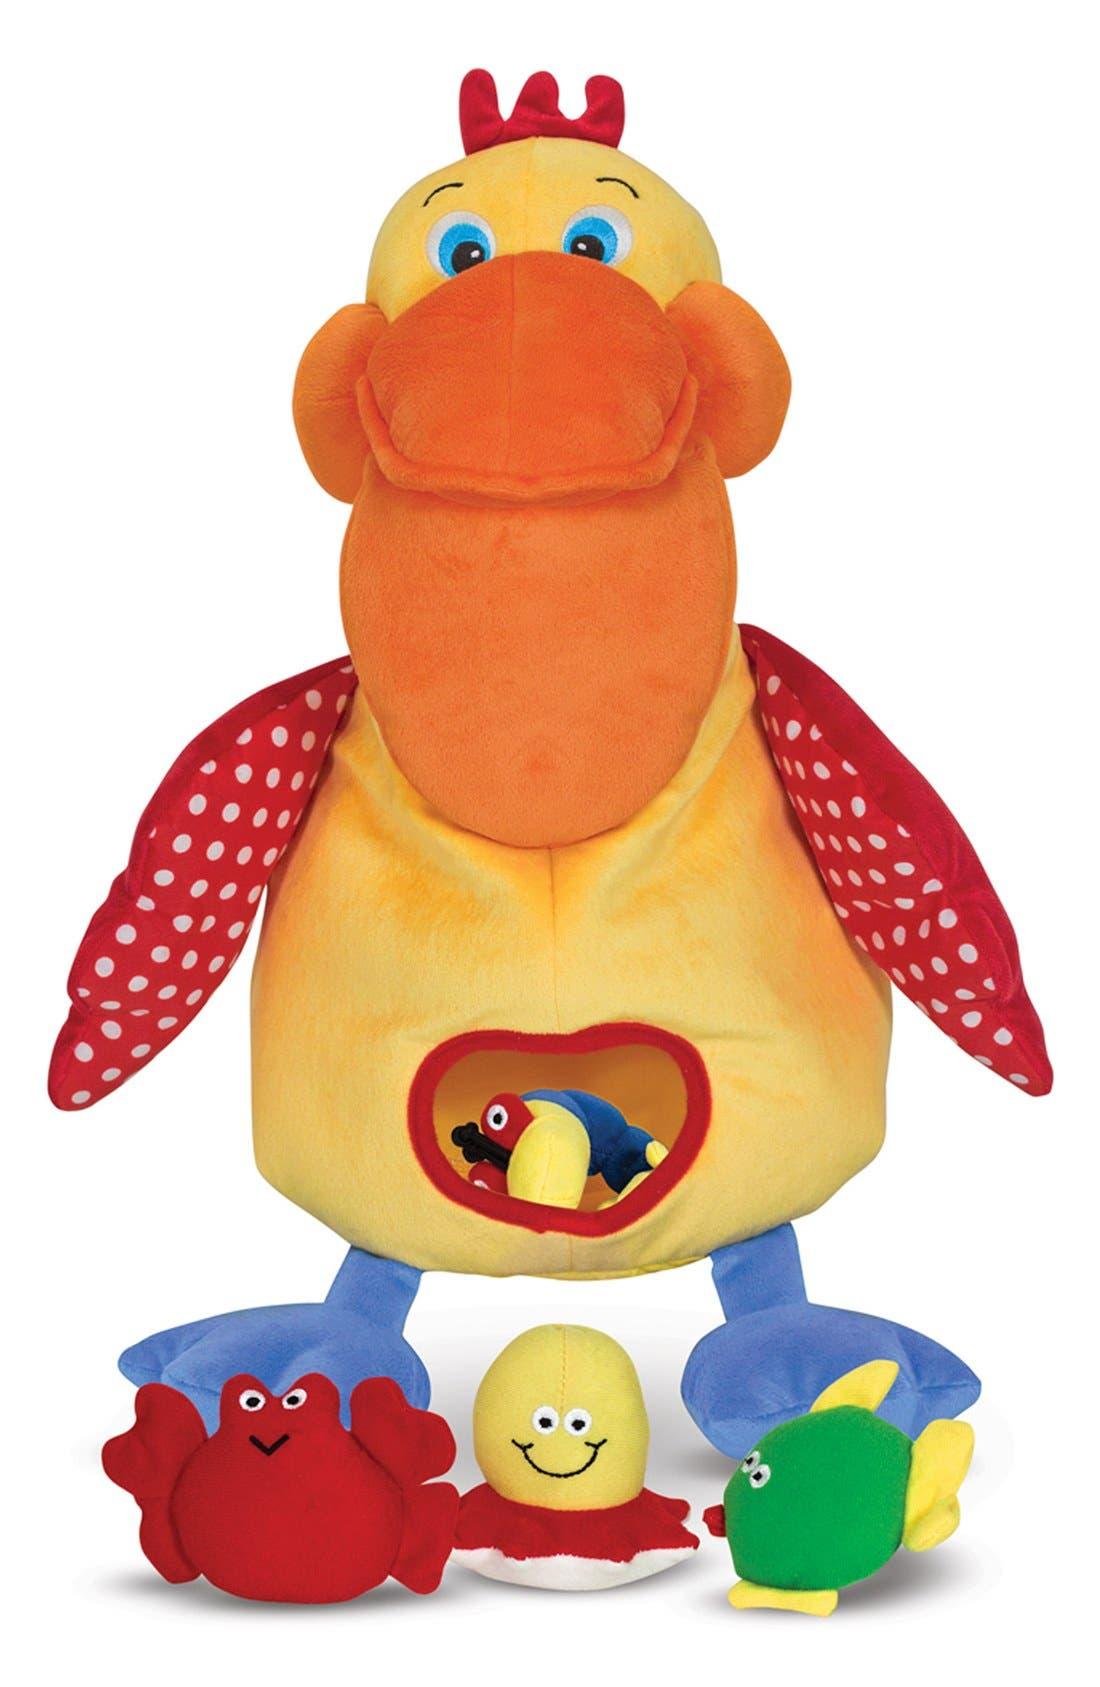 Melissa & Doug 'Hungry Pelican' Plush Toy